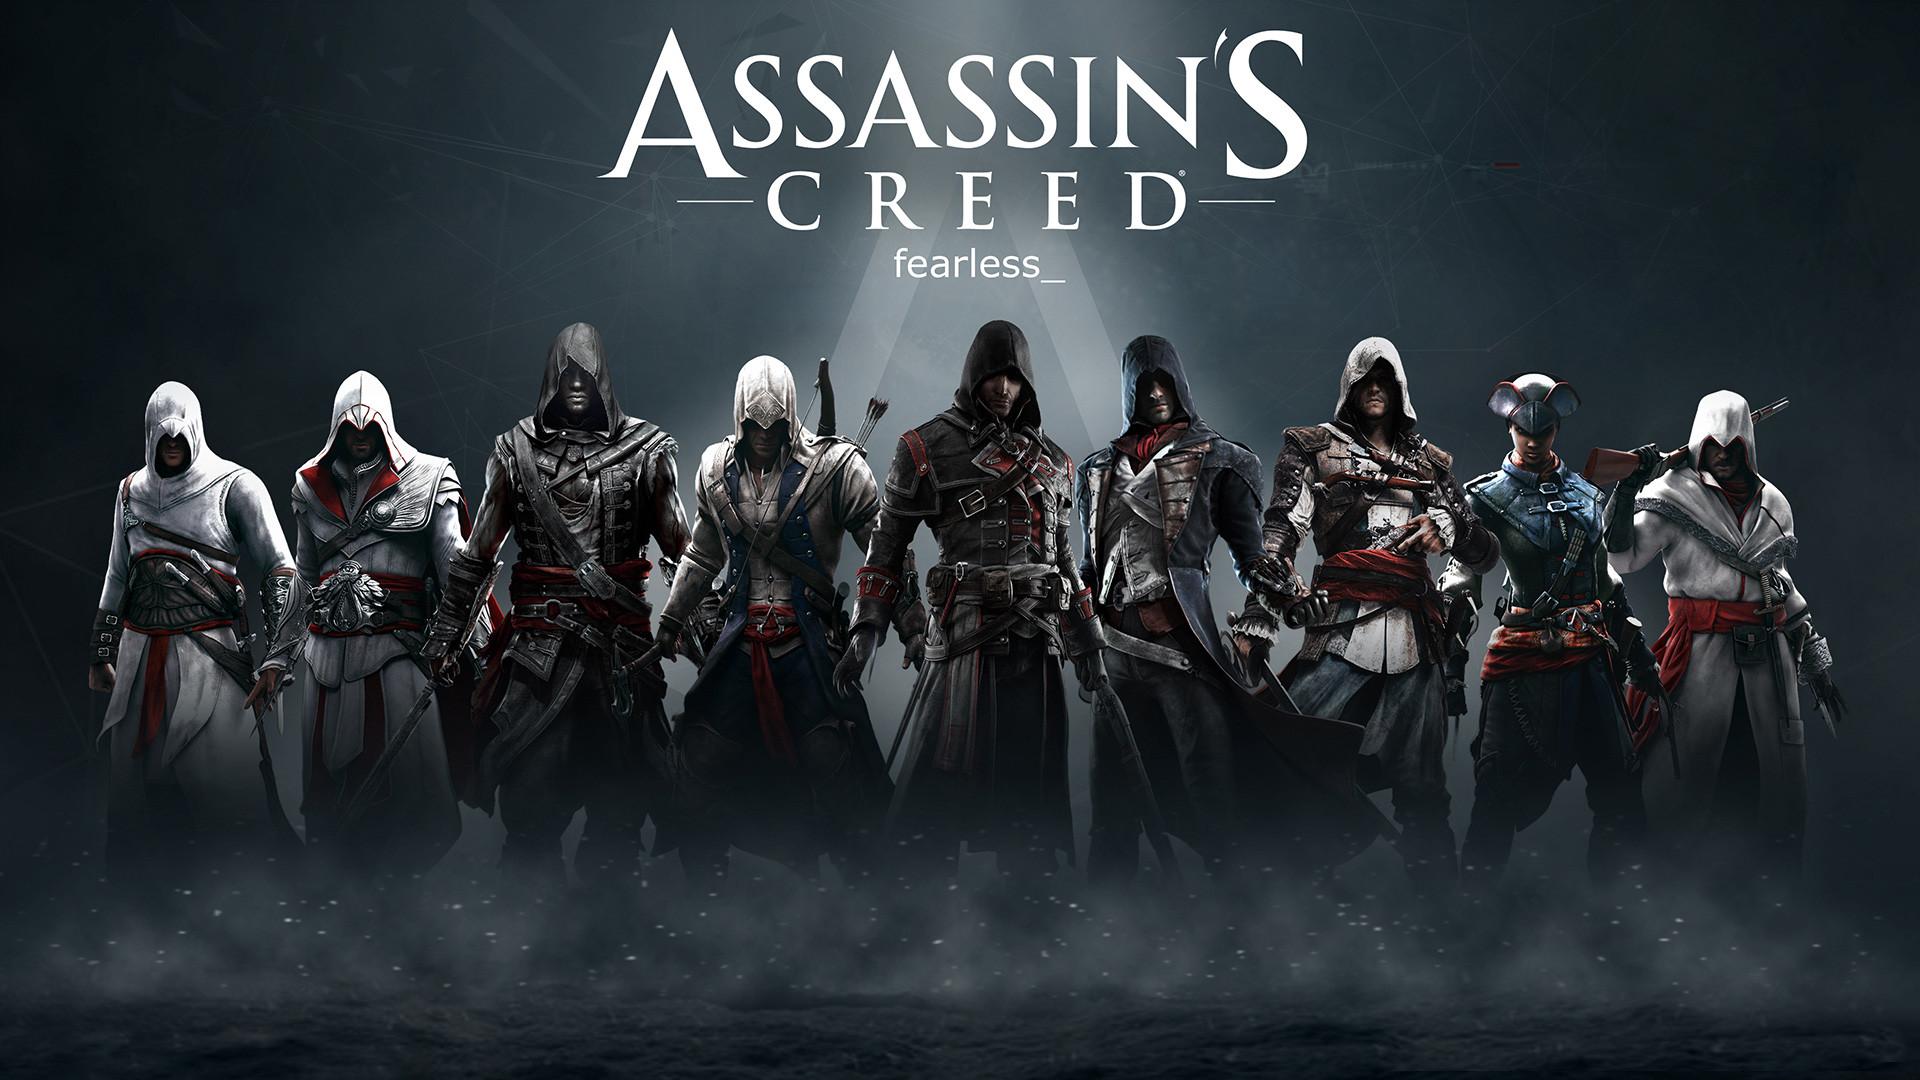 Assassin's Creed Rogue Wallpaper HD 1080p   Assassins creed wallpaper   Assassins  creed Story   #18